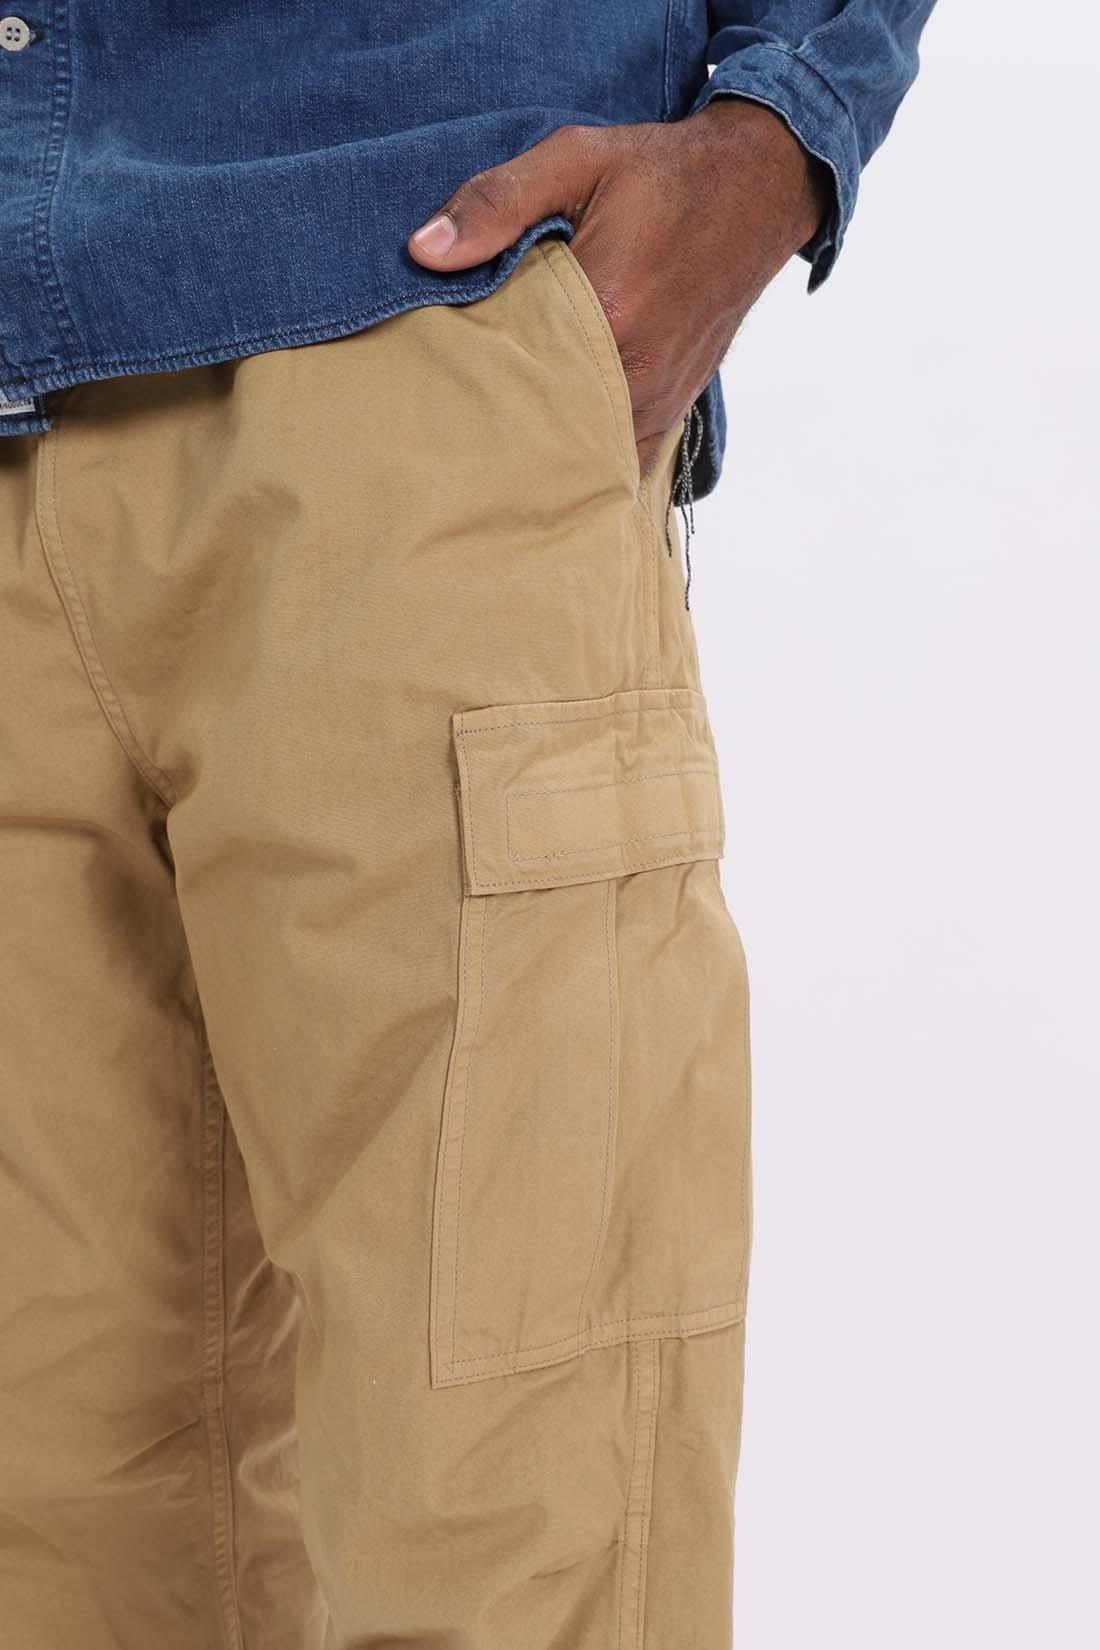 ORSLOW / Army 6 pocket cargo pant Khaki